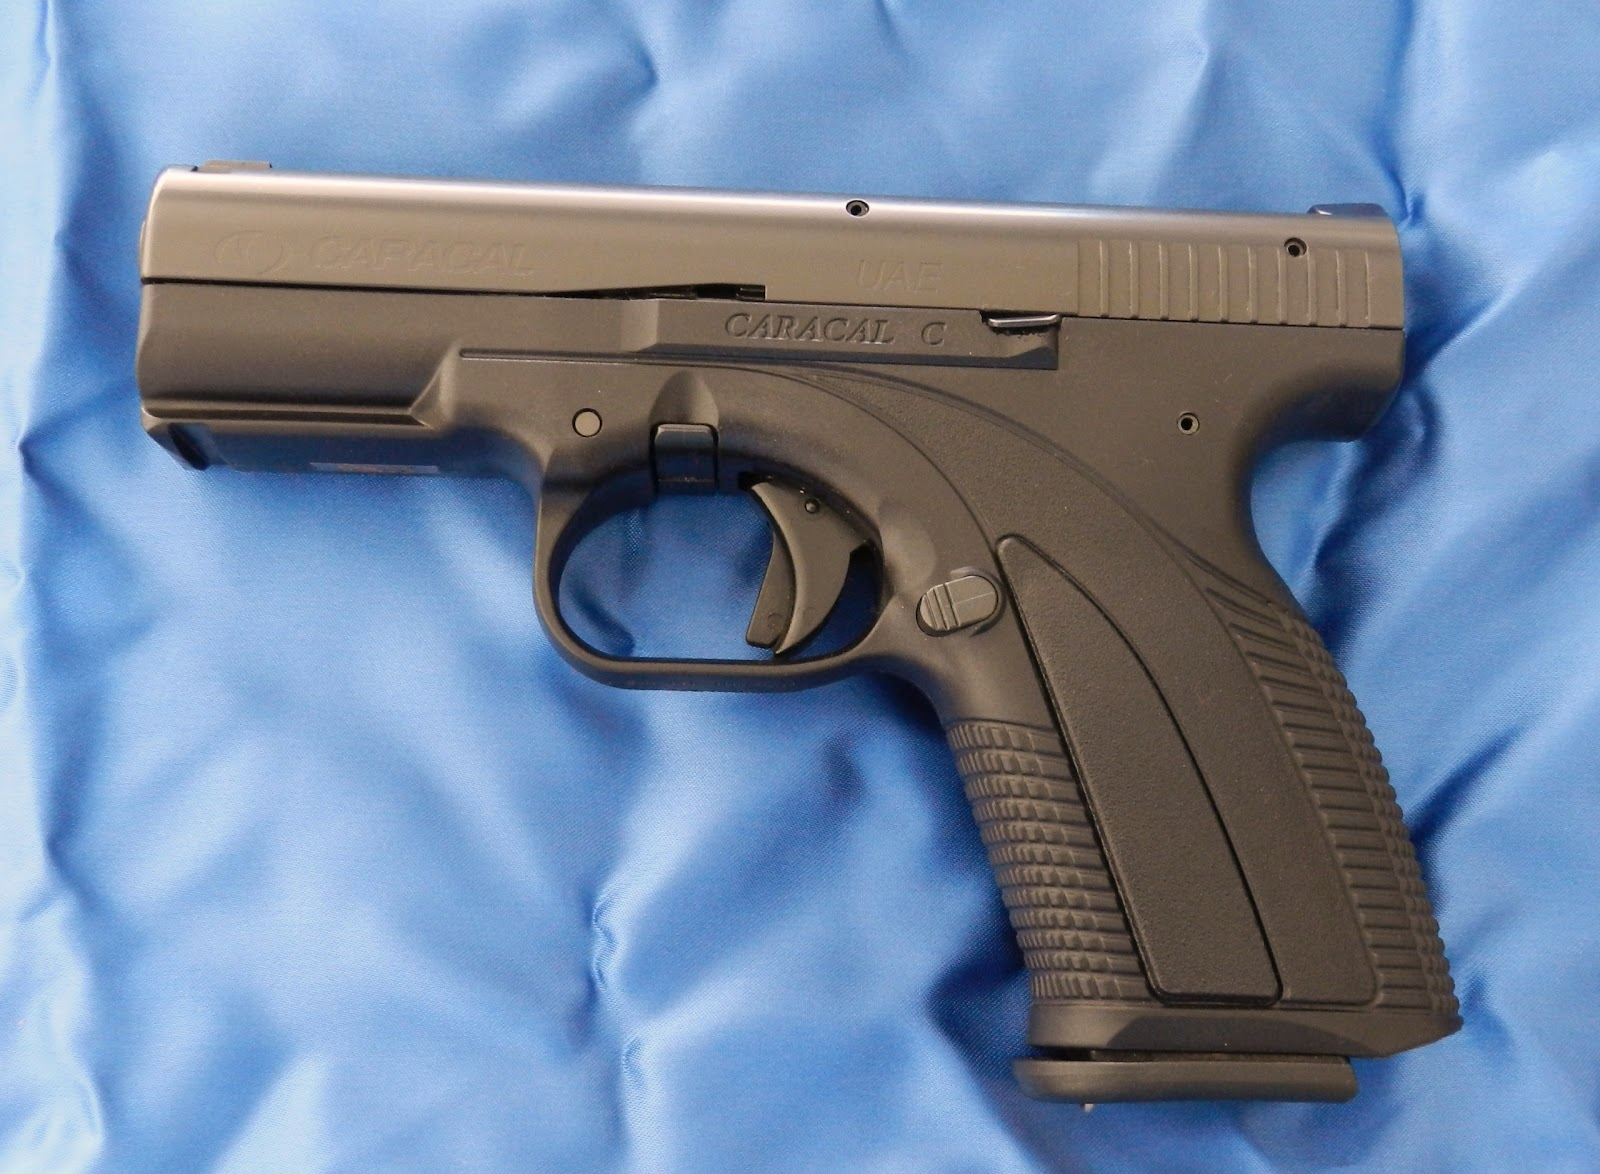 Foto de pistola caracal 92